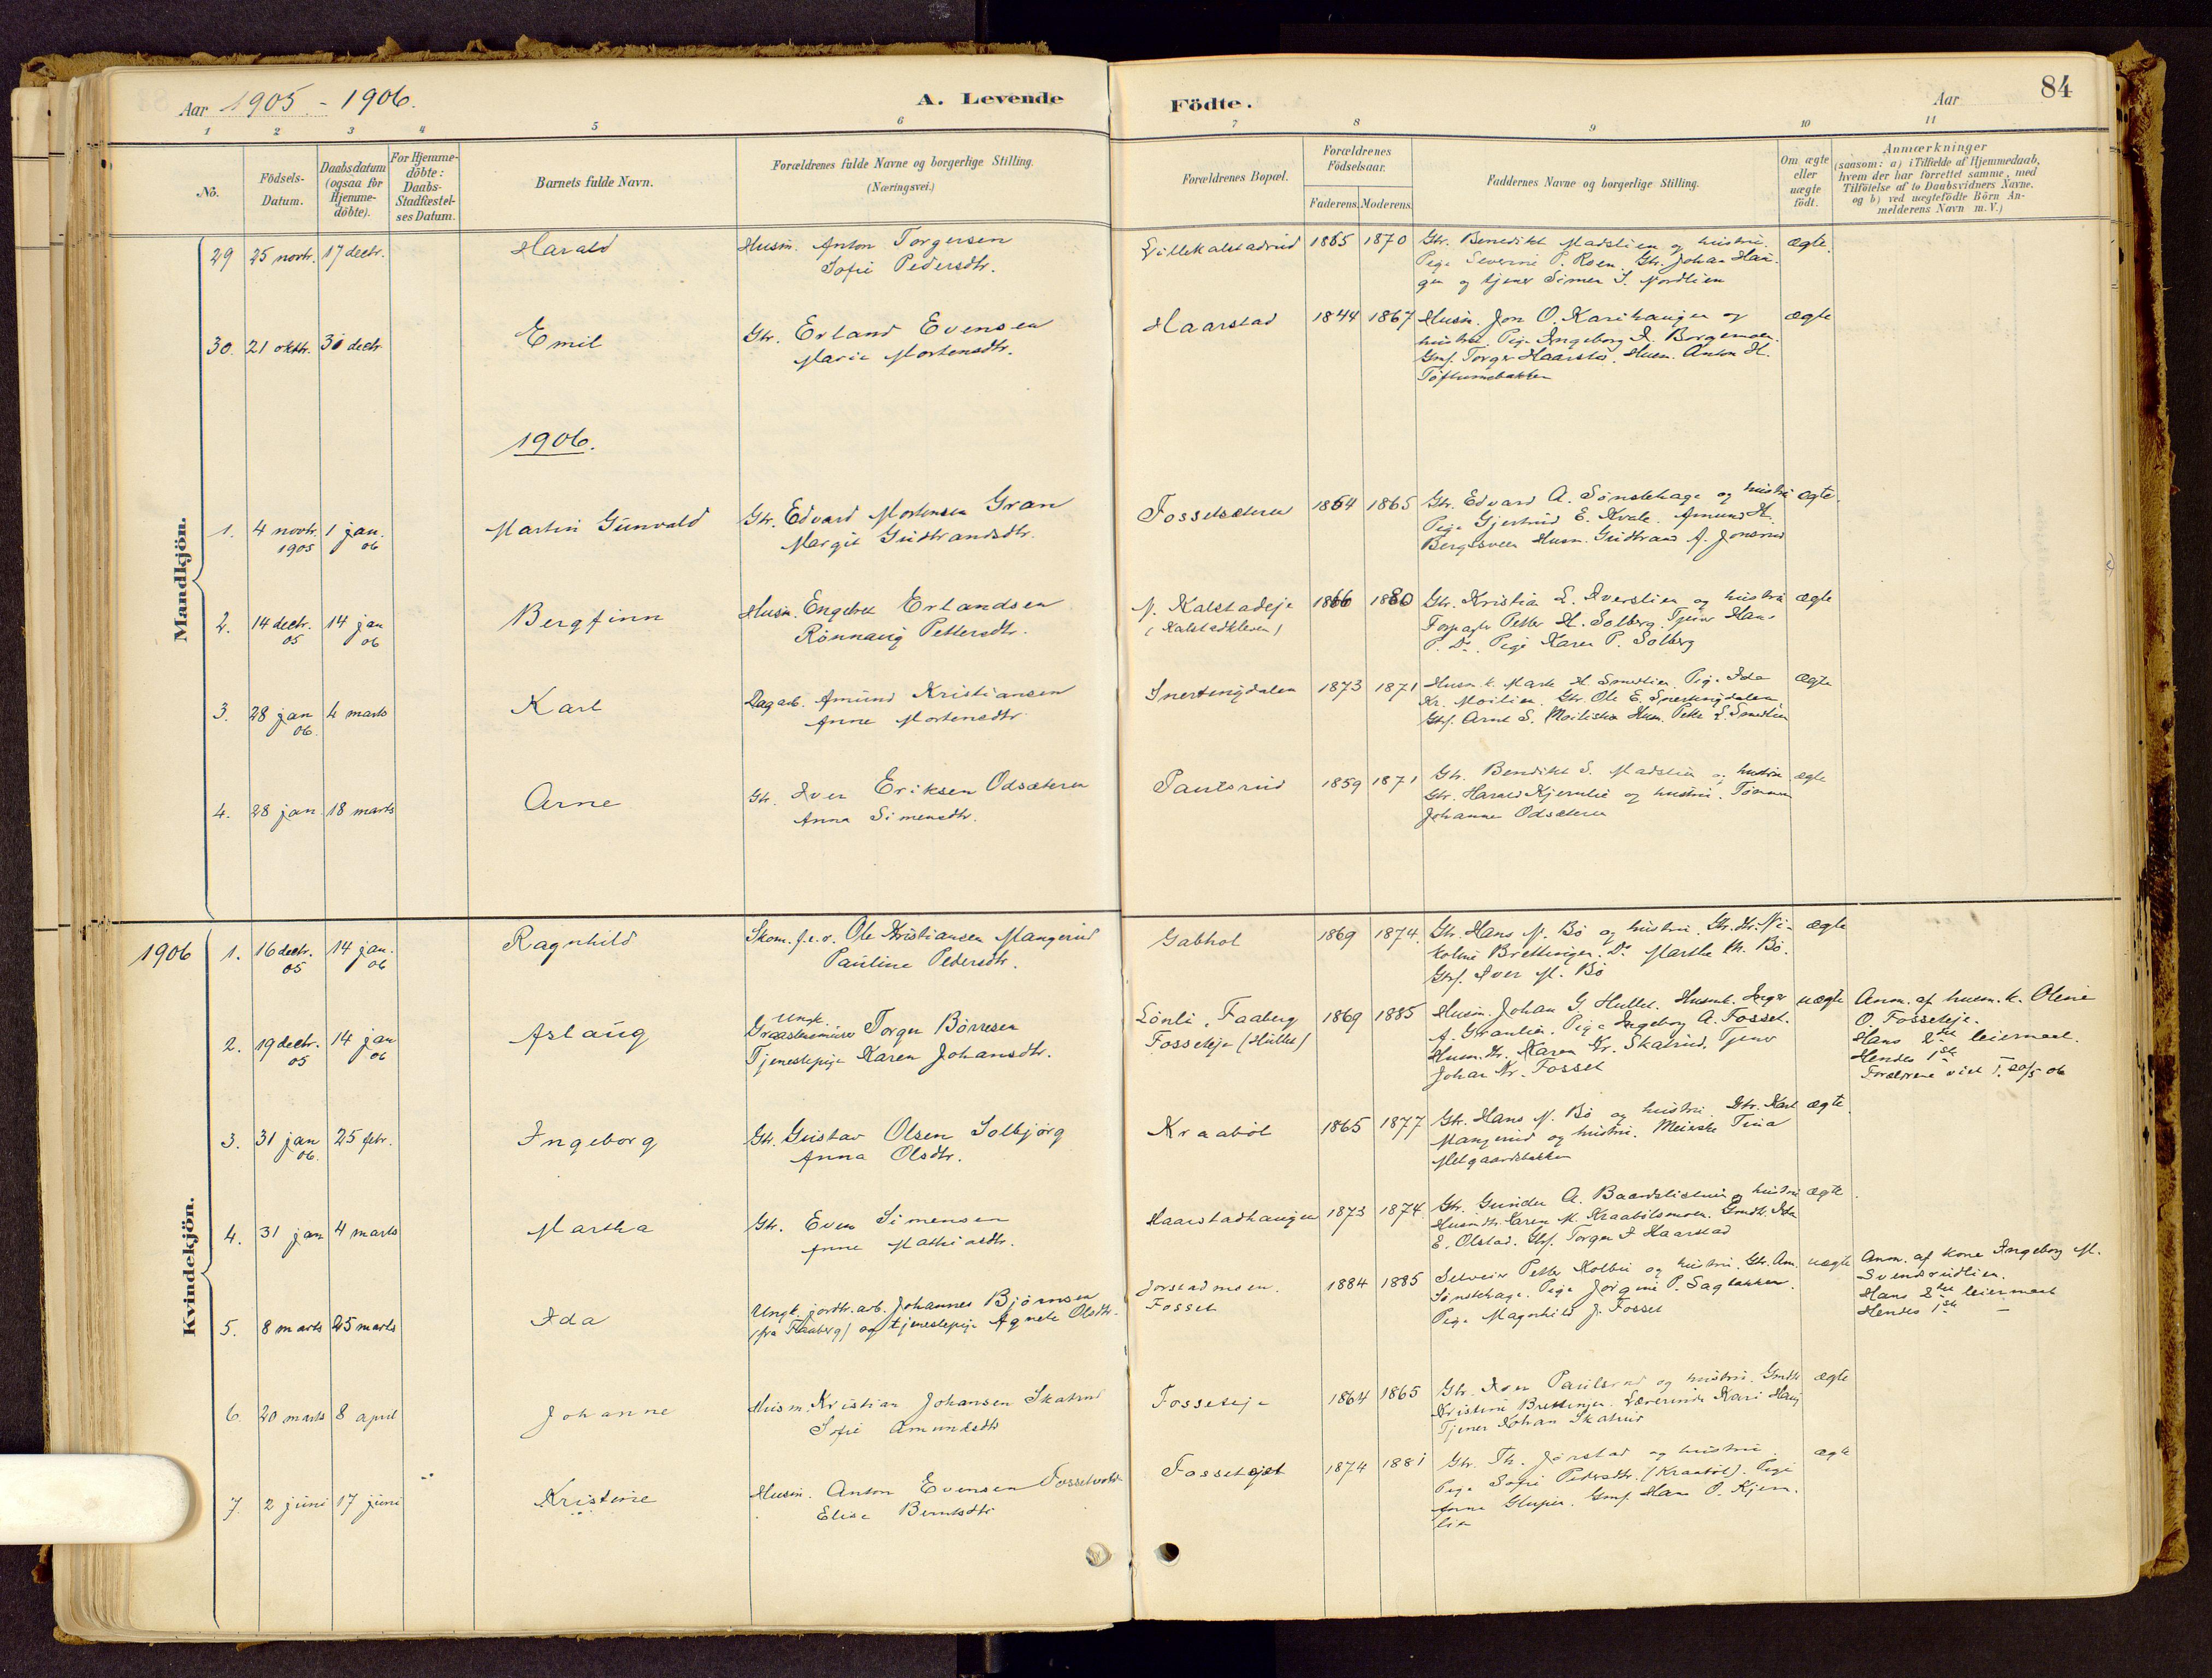 SAH, Vestre Gausdal prestekontor, Ministerialbok nr. 1, 1887-1914, s. 84